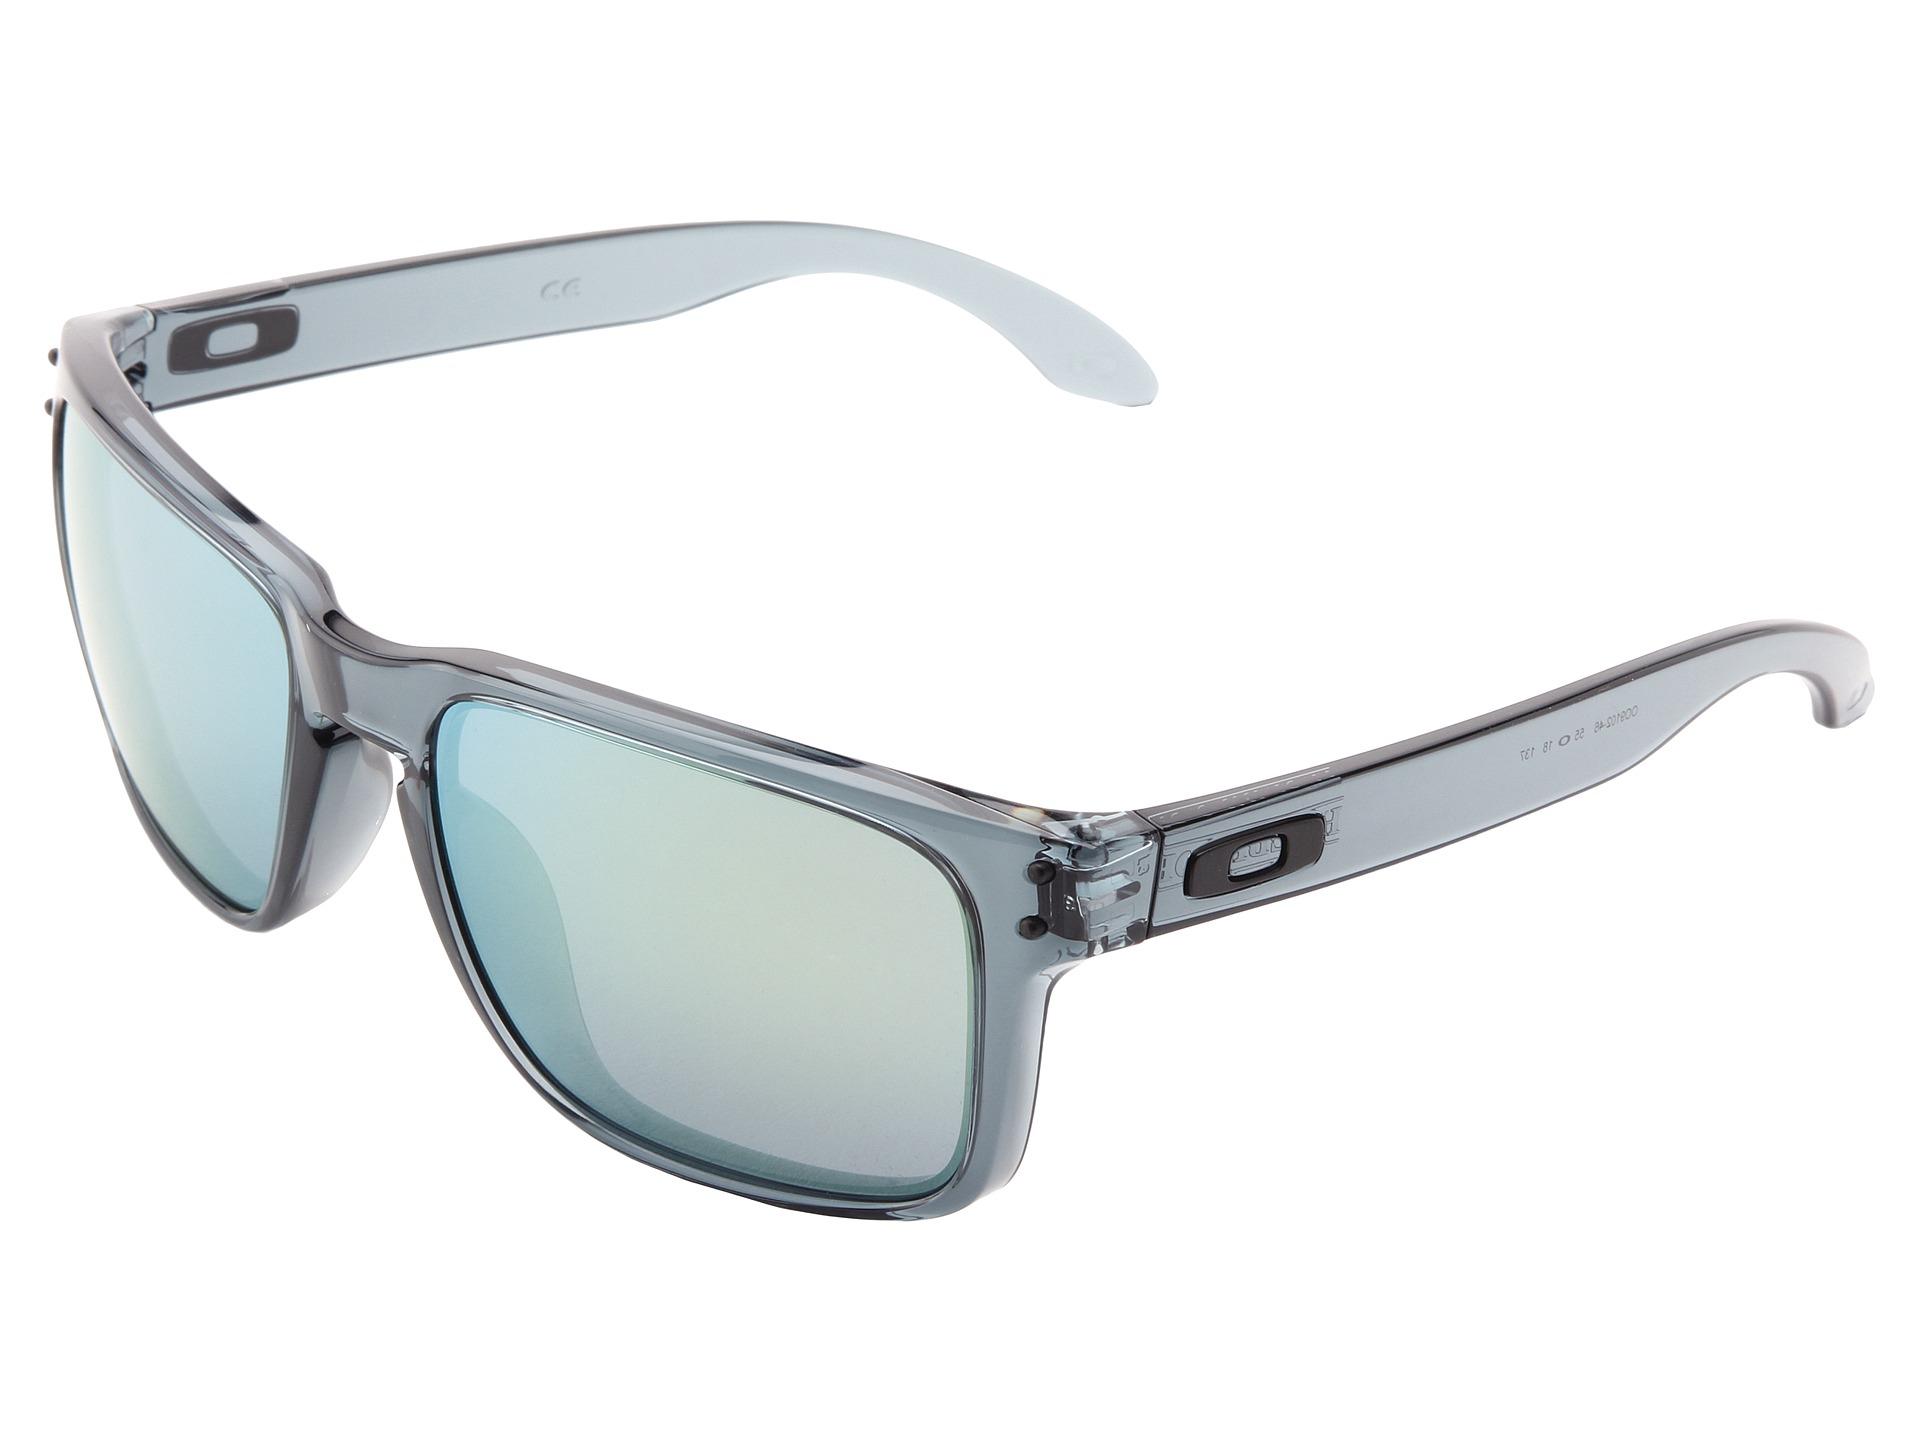 b1892570cc Oakley Sunglasses Dubai Duty Free « Heritage Malta